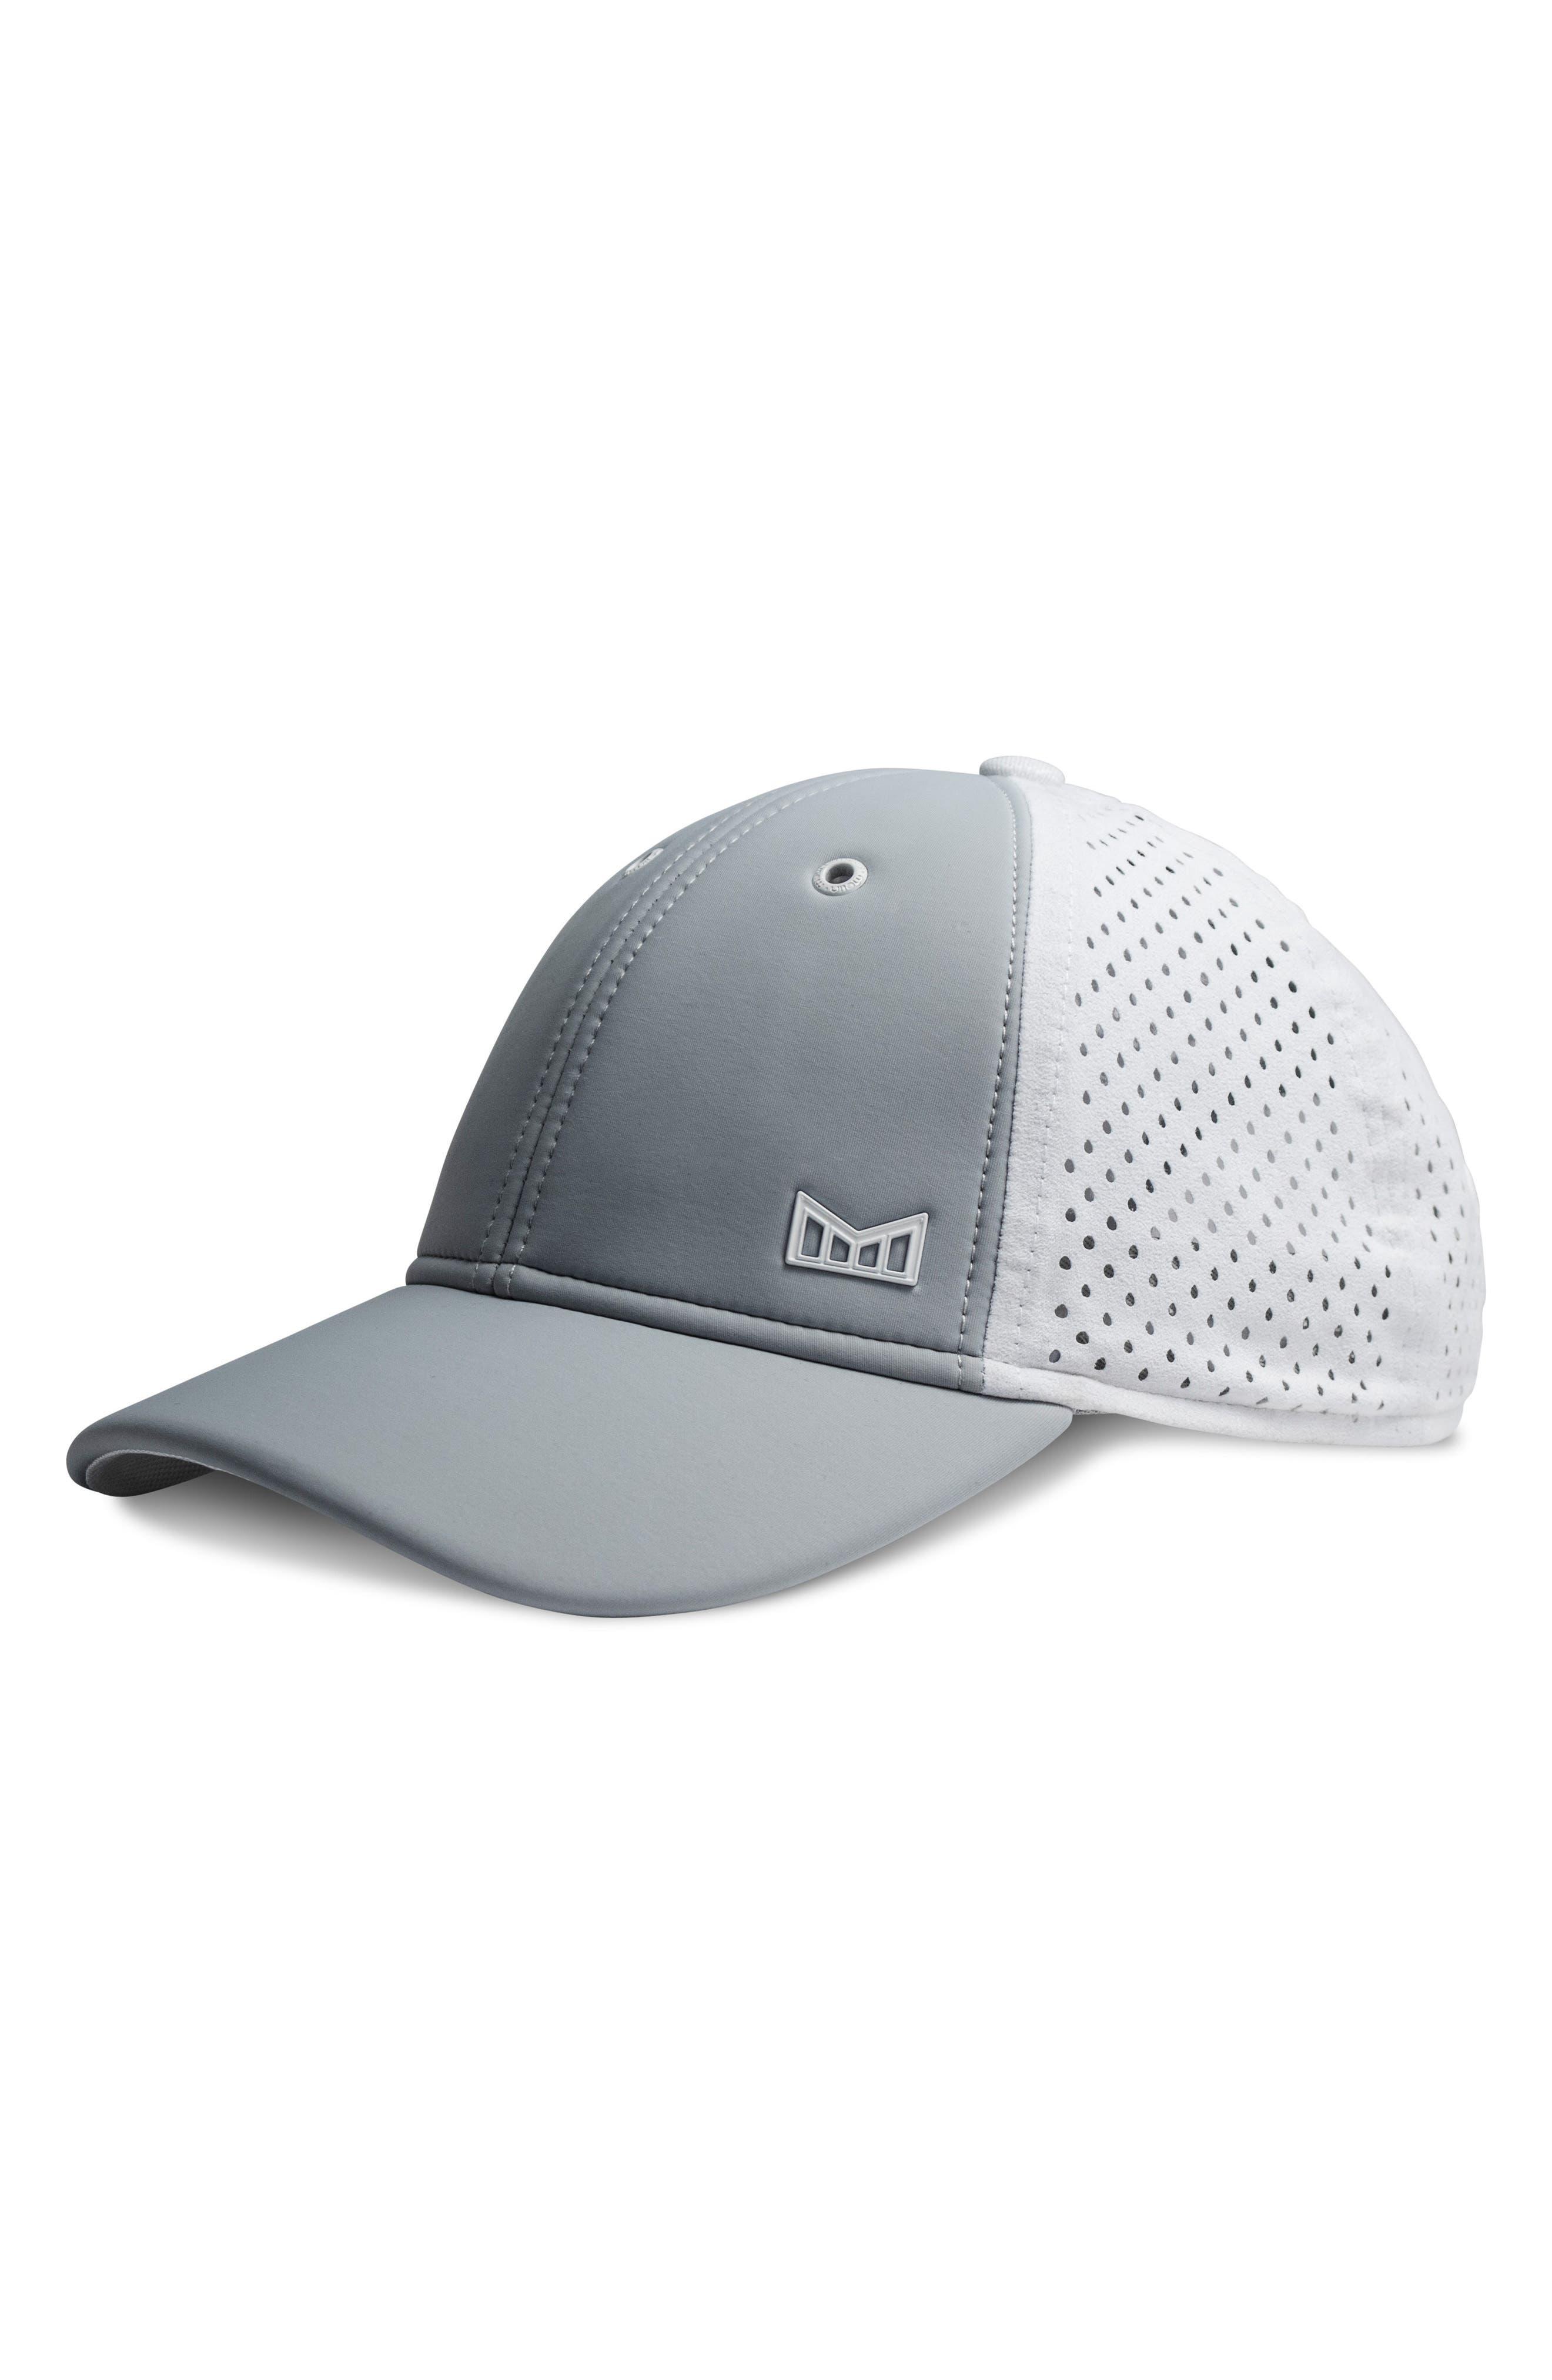 Melin Trooper II Snapback Baseball Cap